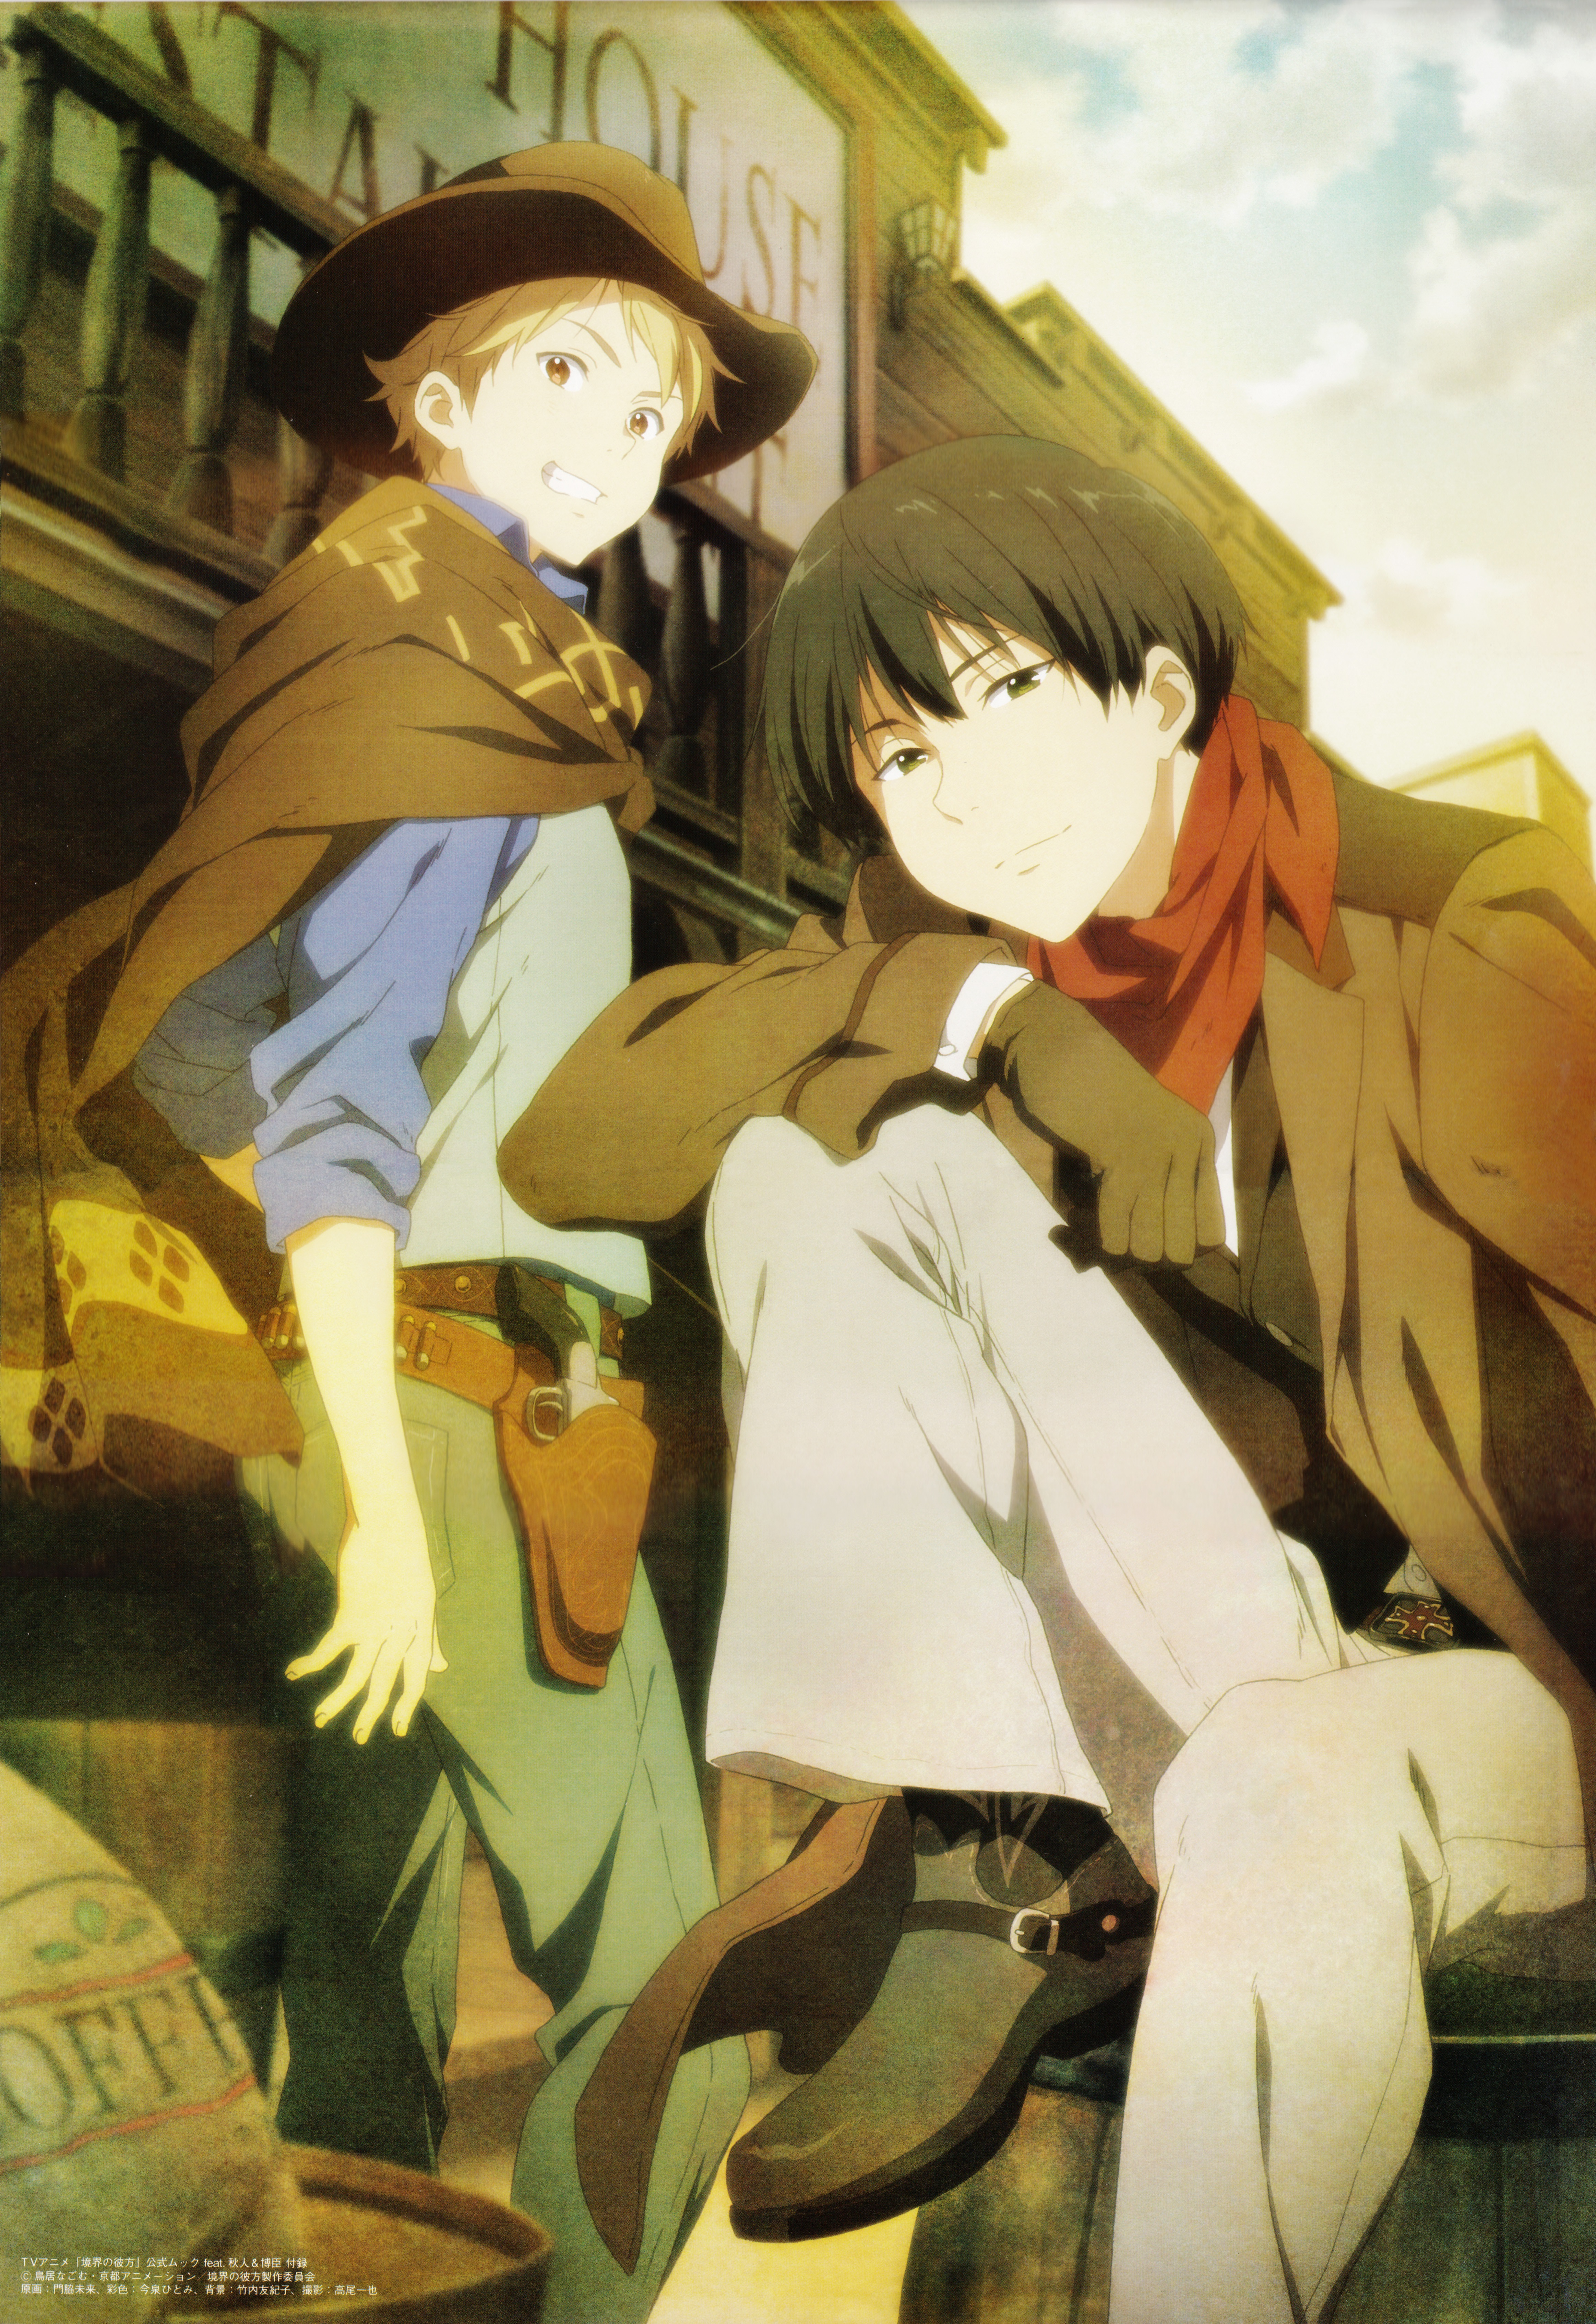 Image Result For Download Wallpaper Anime Kyoukai No Kanata